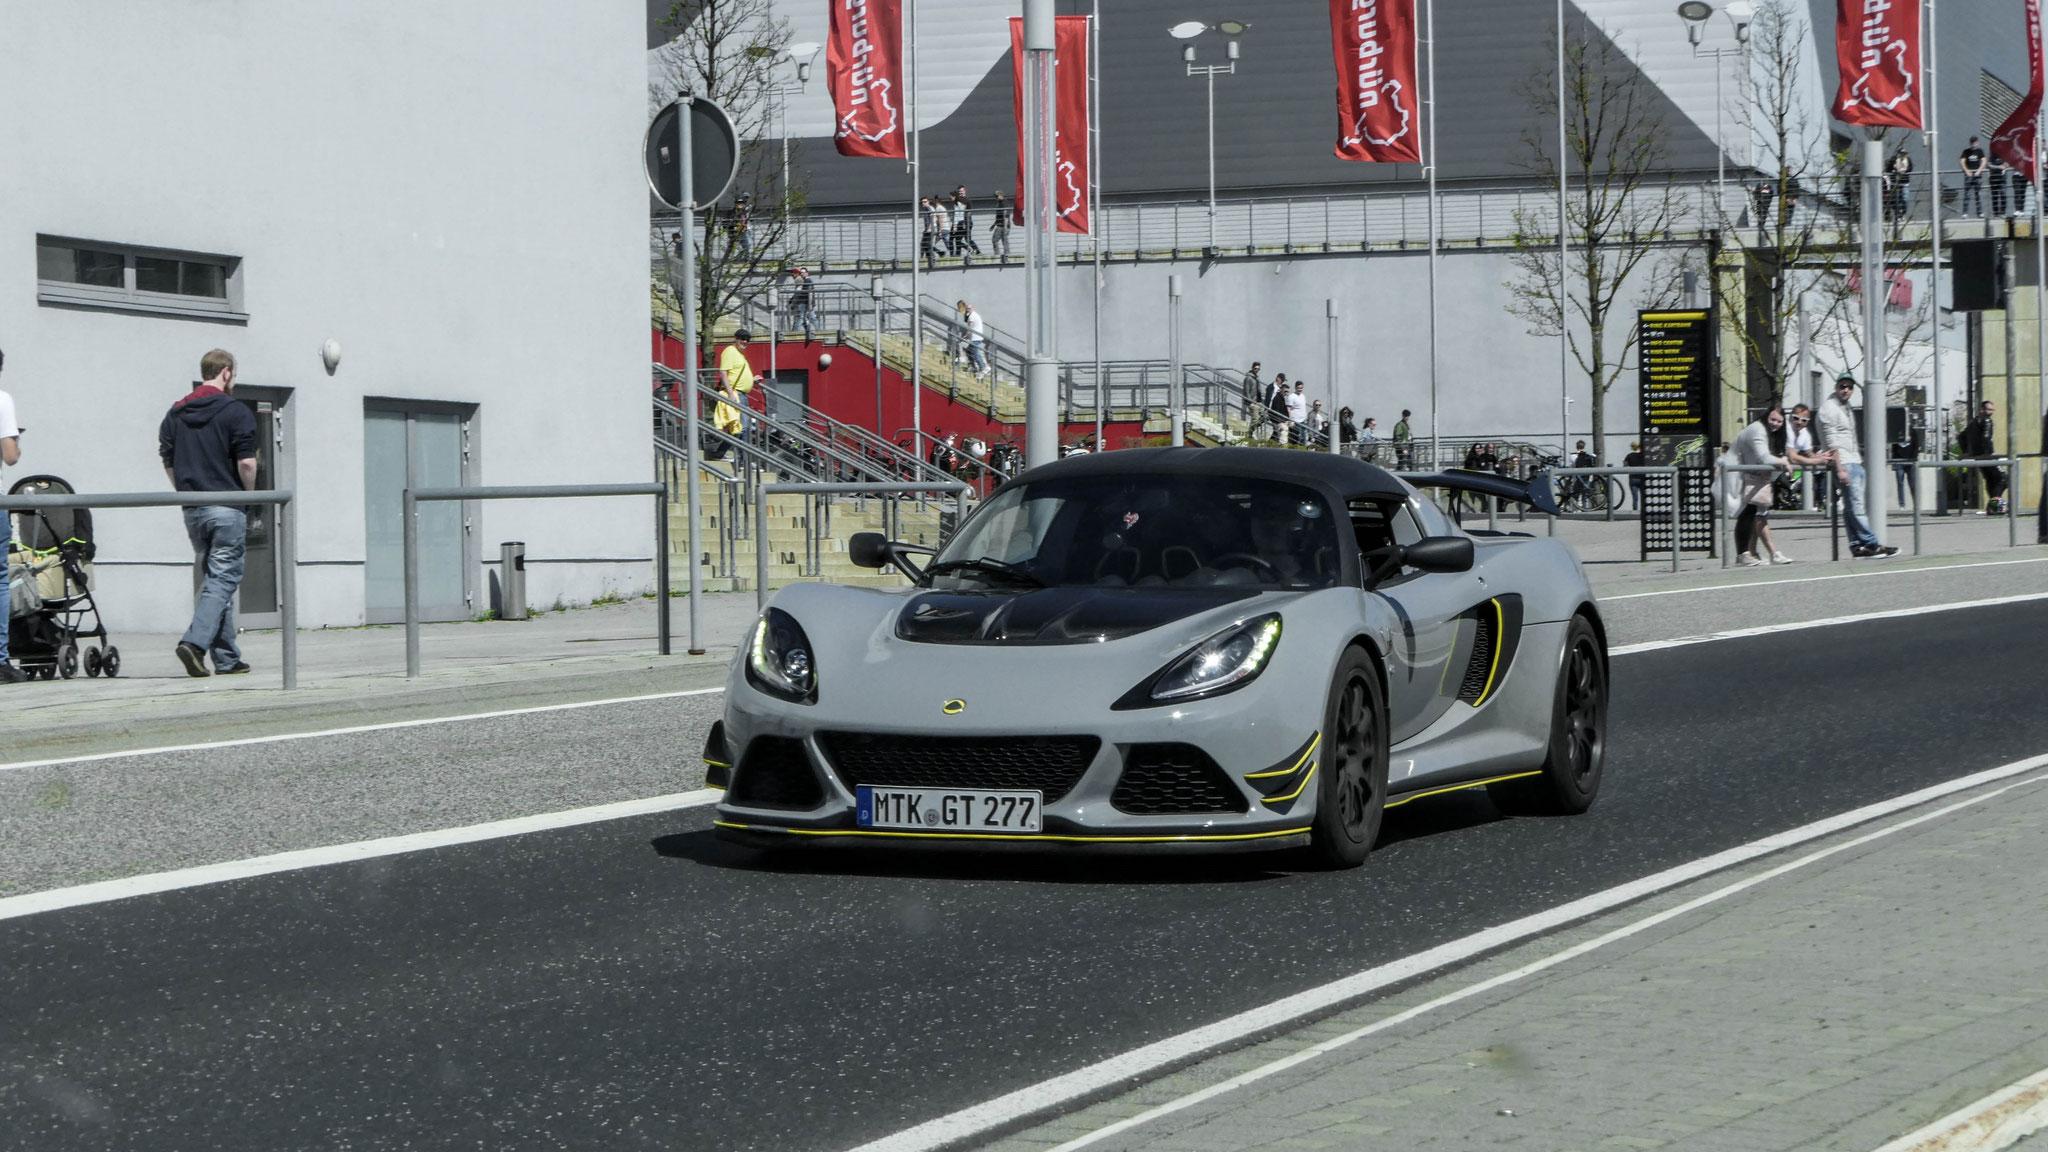 Lotus Exige 380 Sport - MTK-GT-277